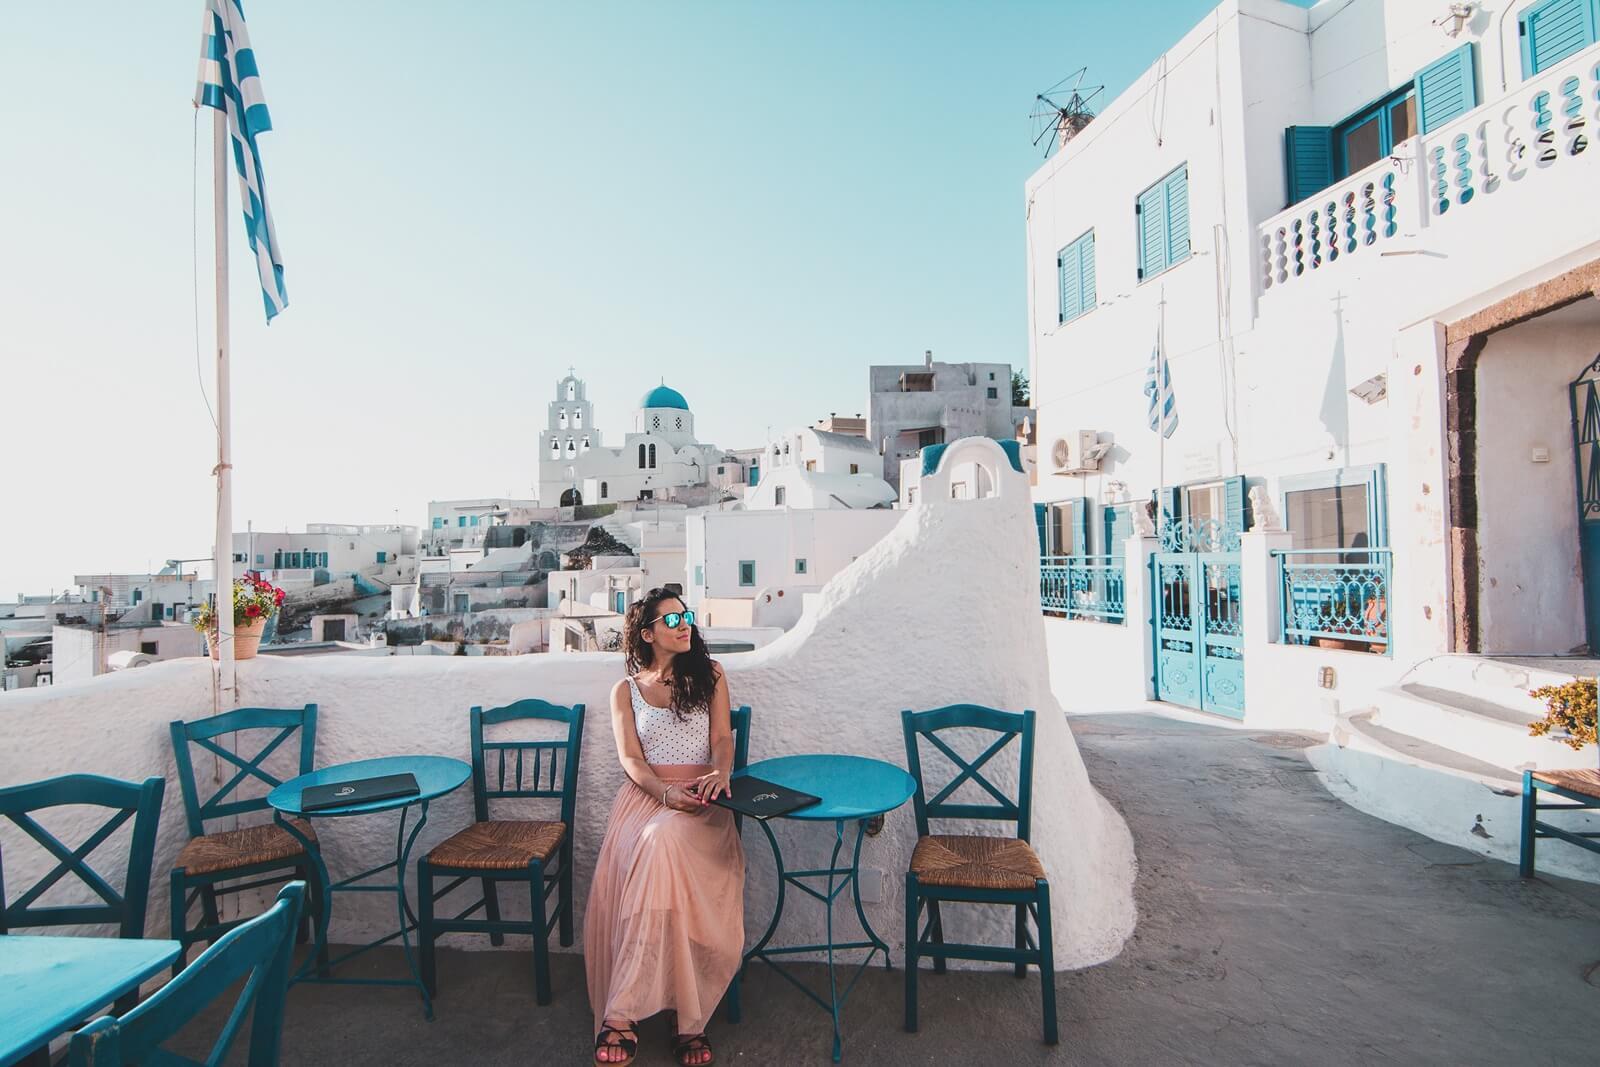 santorini-greece-lavienblog-allrightsreserved